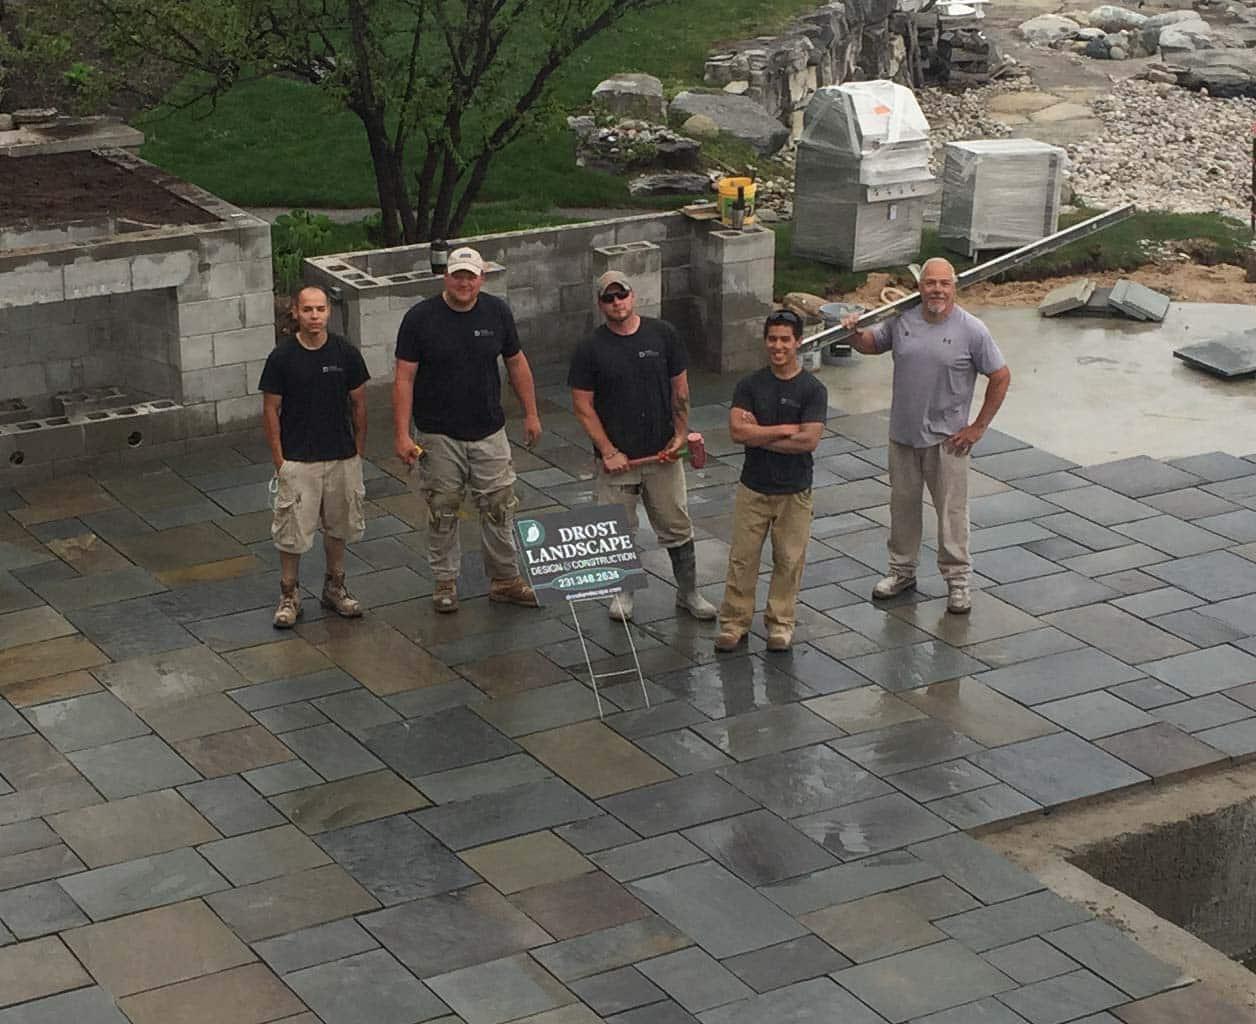 Drost Landscape crew on site